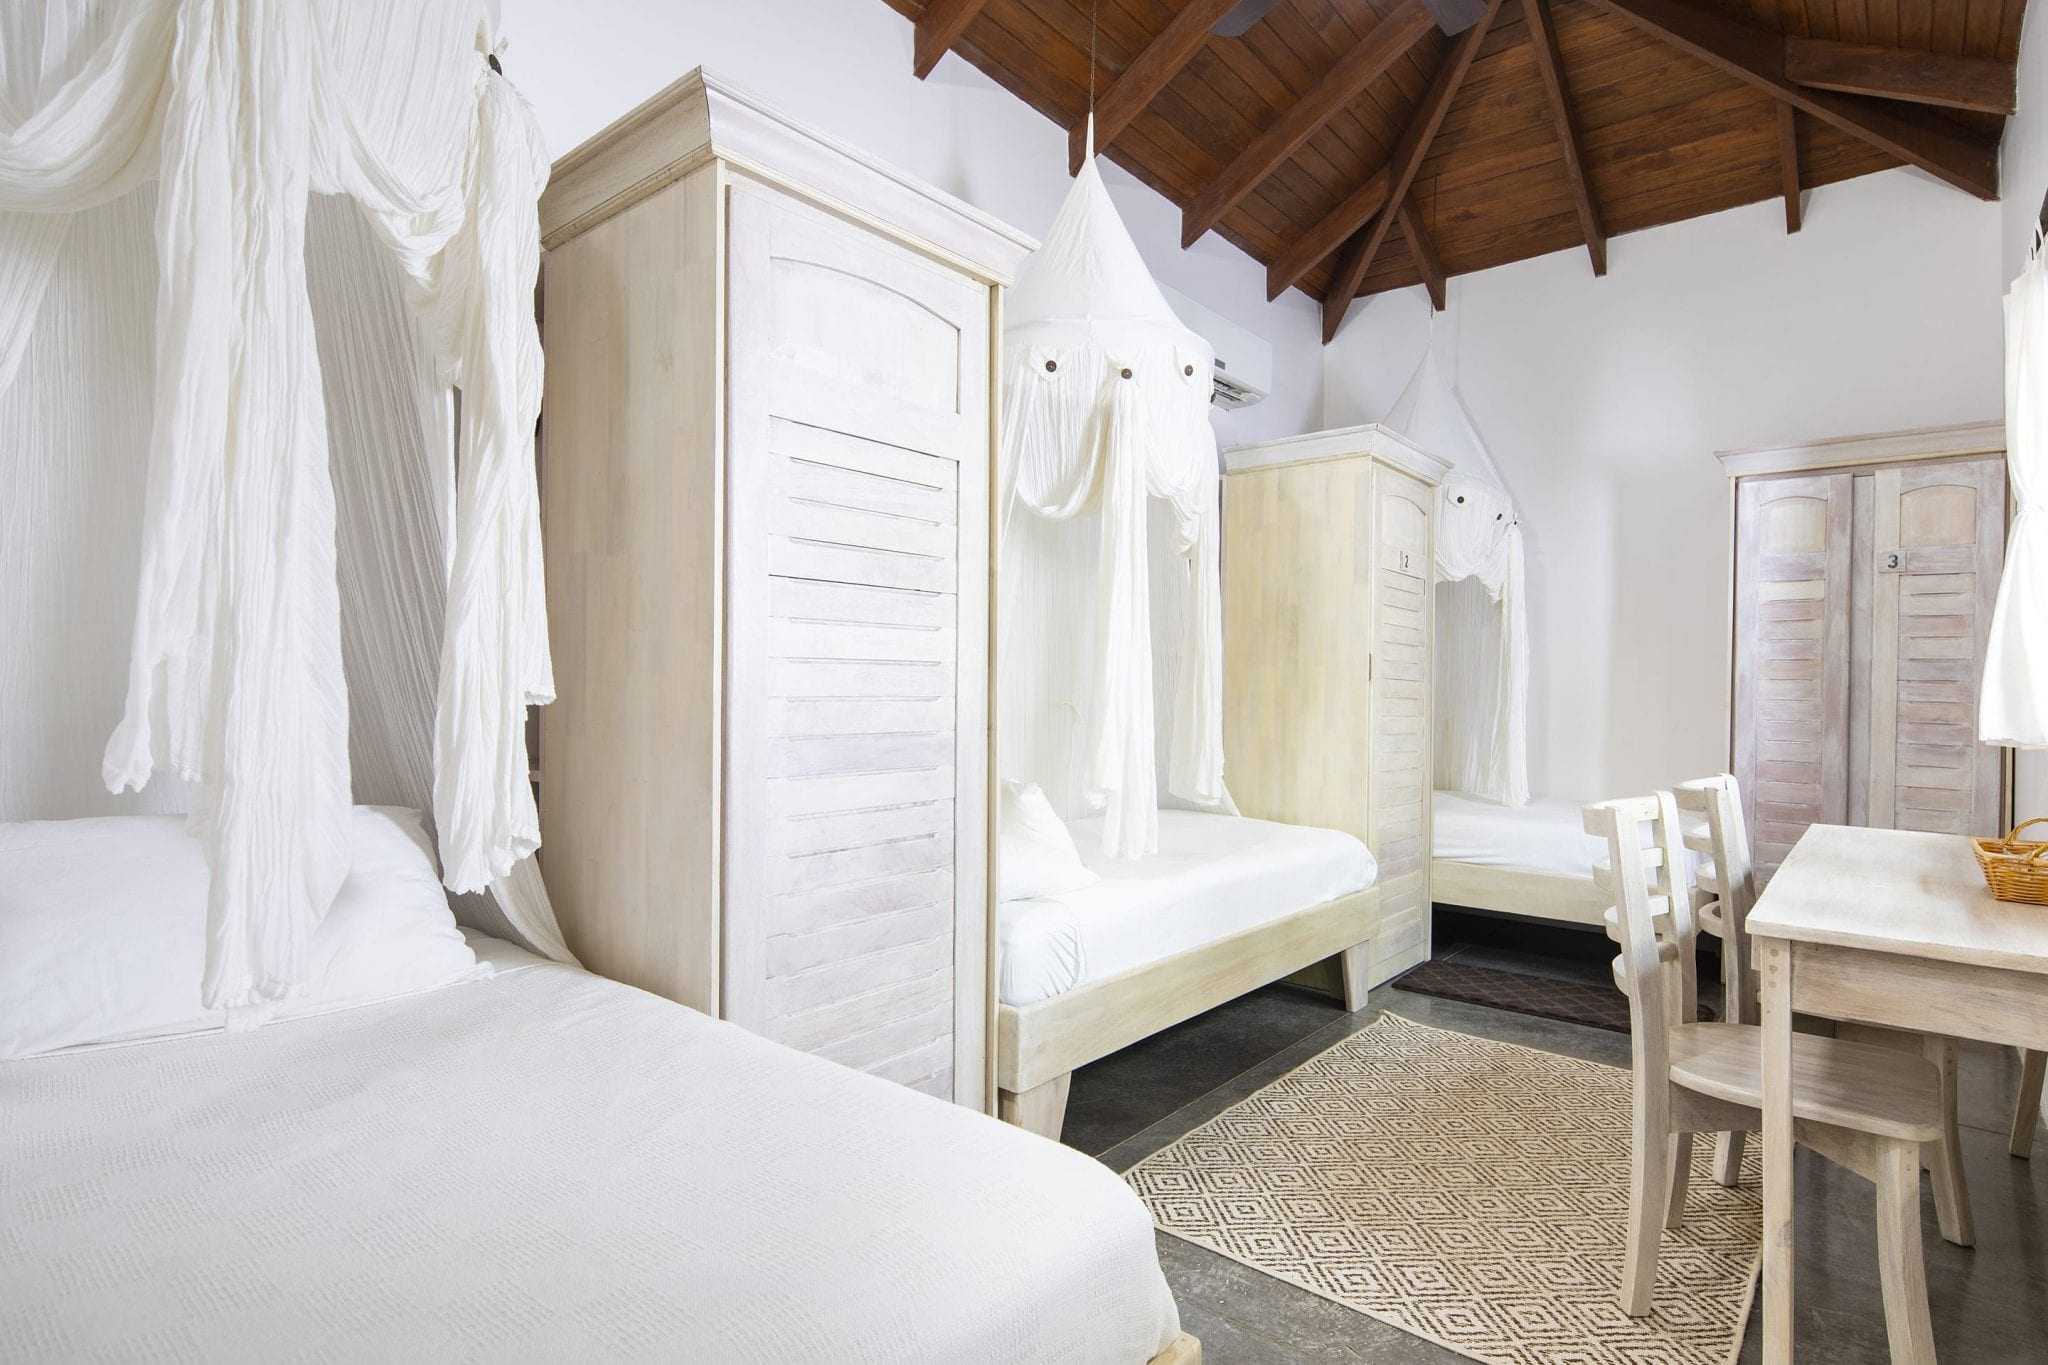 Bodhi Tree Dorm Room